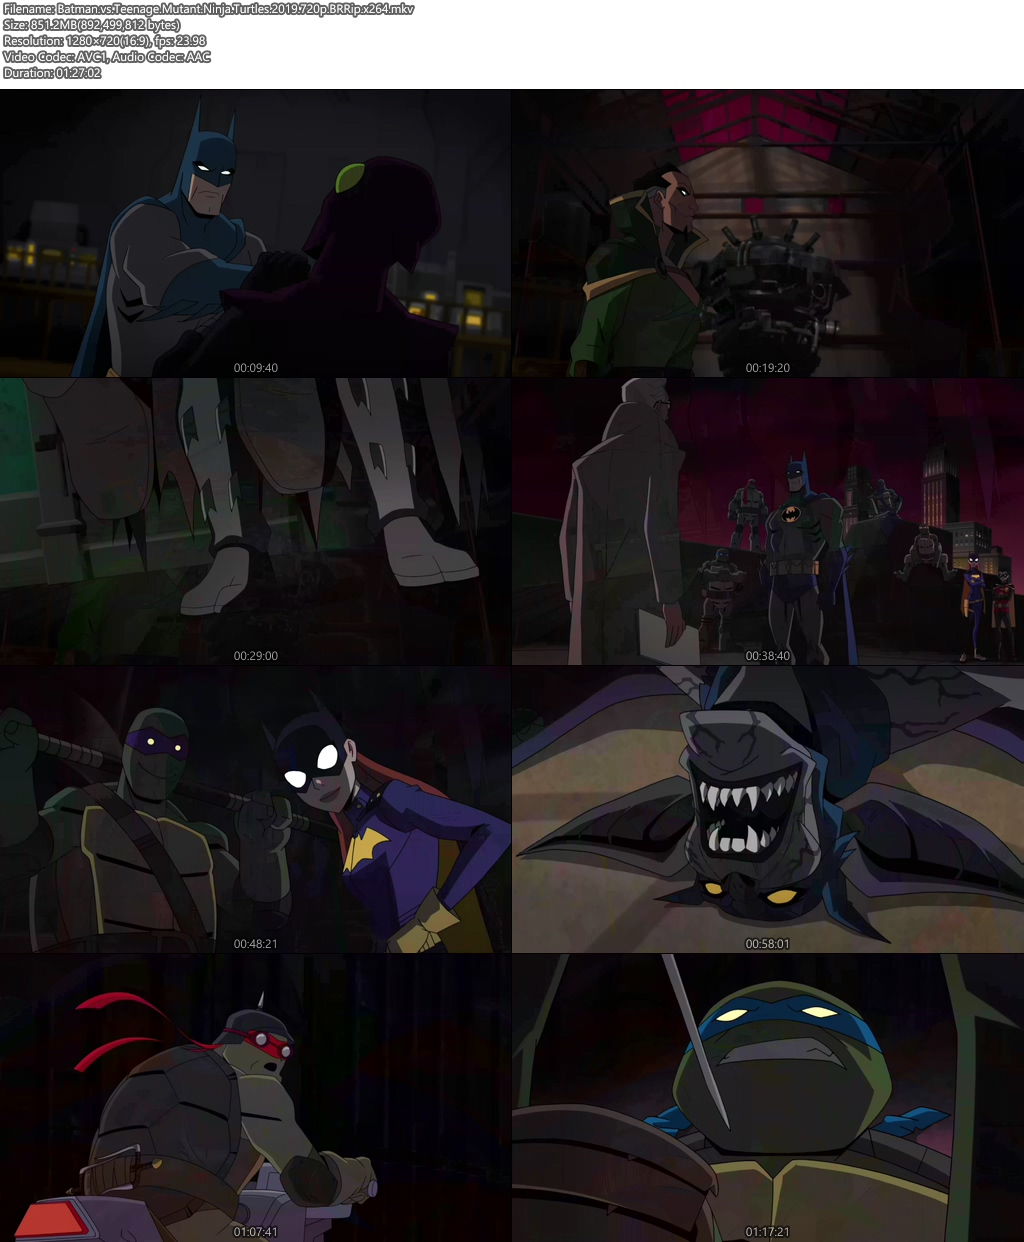 Batman vs Teenage Mutant Ninja Turtles 2019 720p BRRip | 480p 300MB | 100MB HEVC Screenshot